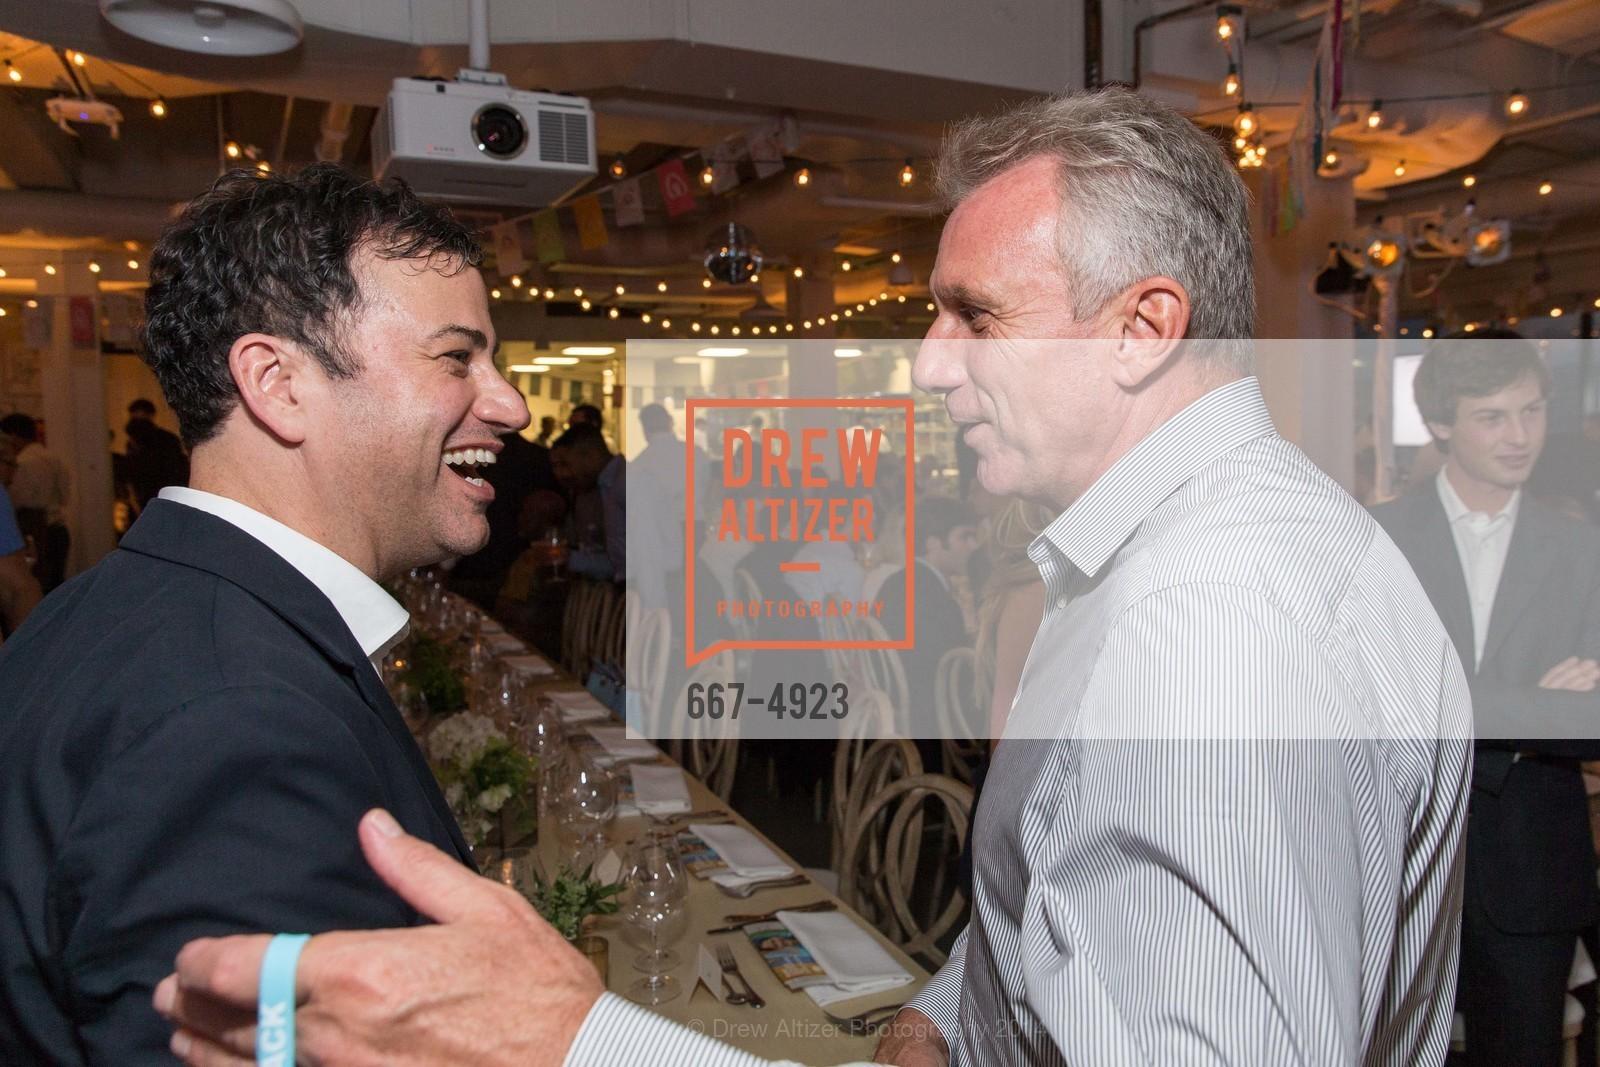 Jimmy Kimmel, Joe Montana, Photo #667-4923